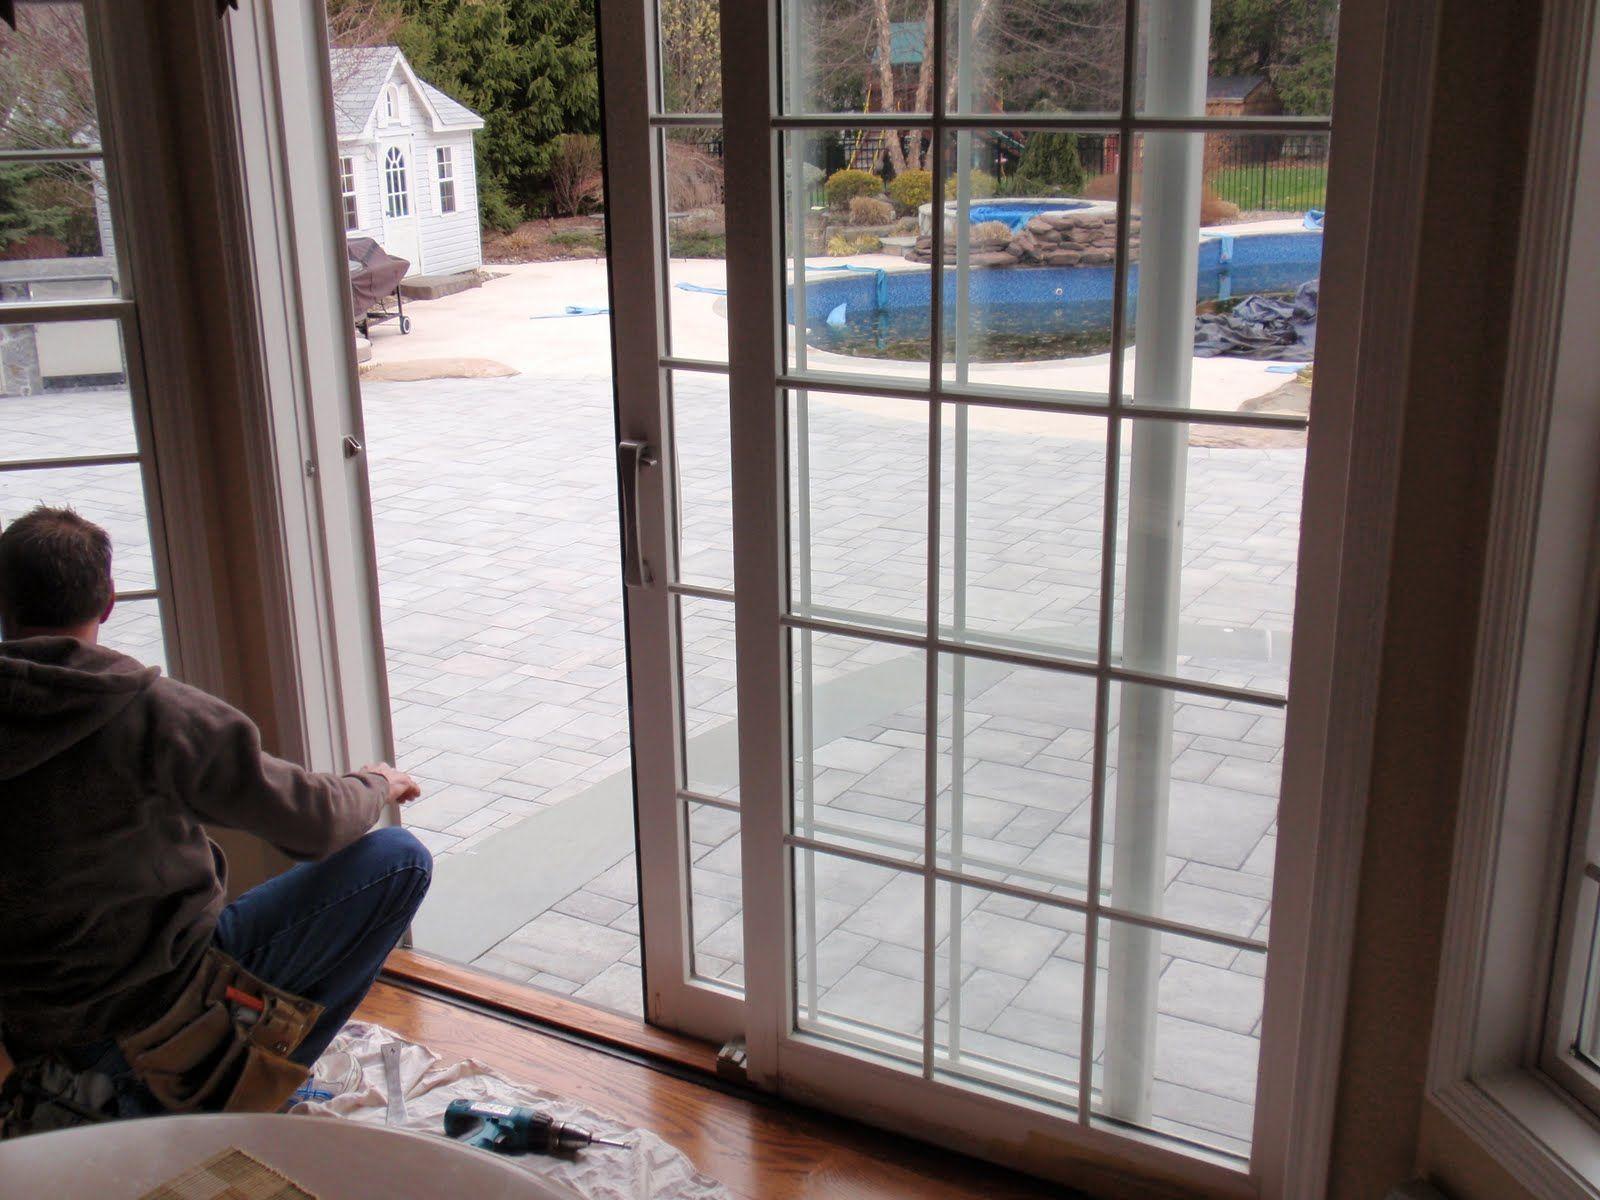 Contemporary Pella Encompass Sliding Patio Doors For Patio Terraced House Ideas Sliding Glass Doors Patio Sliding Glass Door Replacement Patio Doors